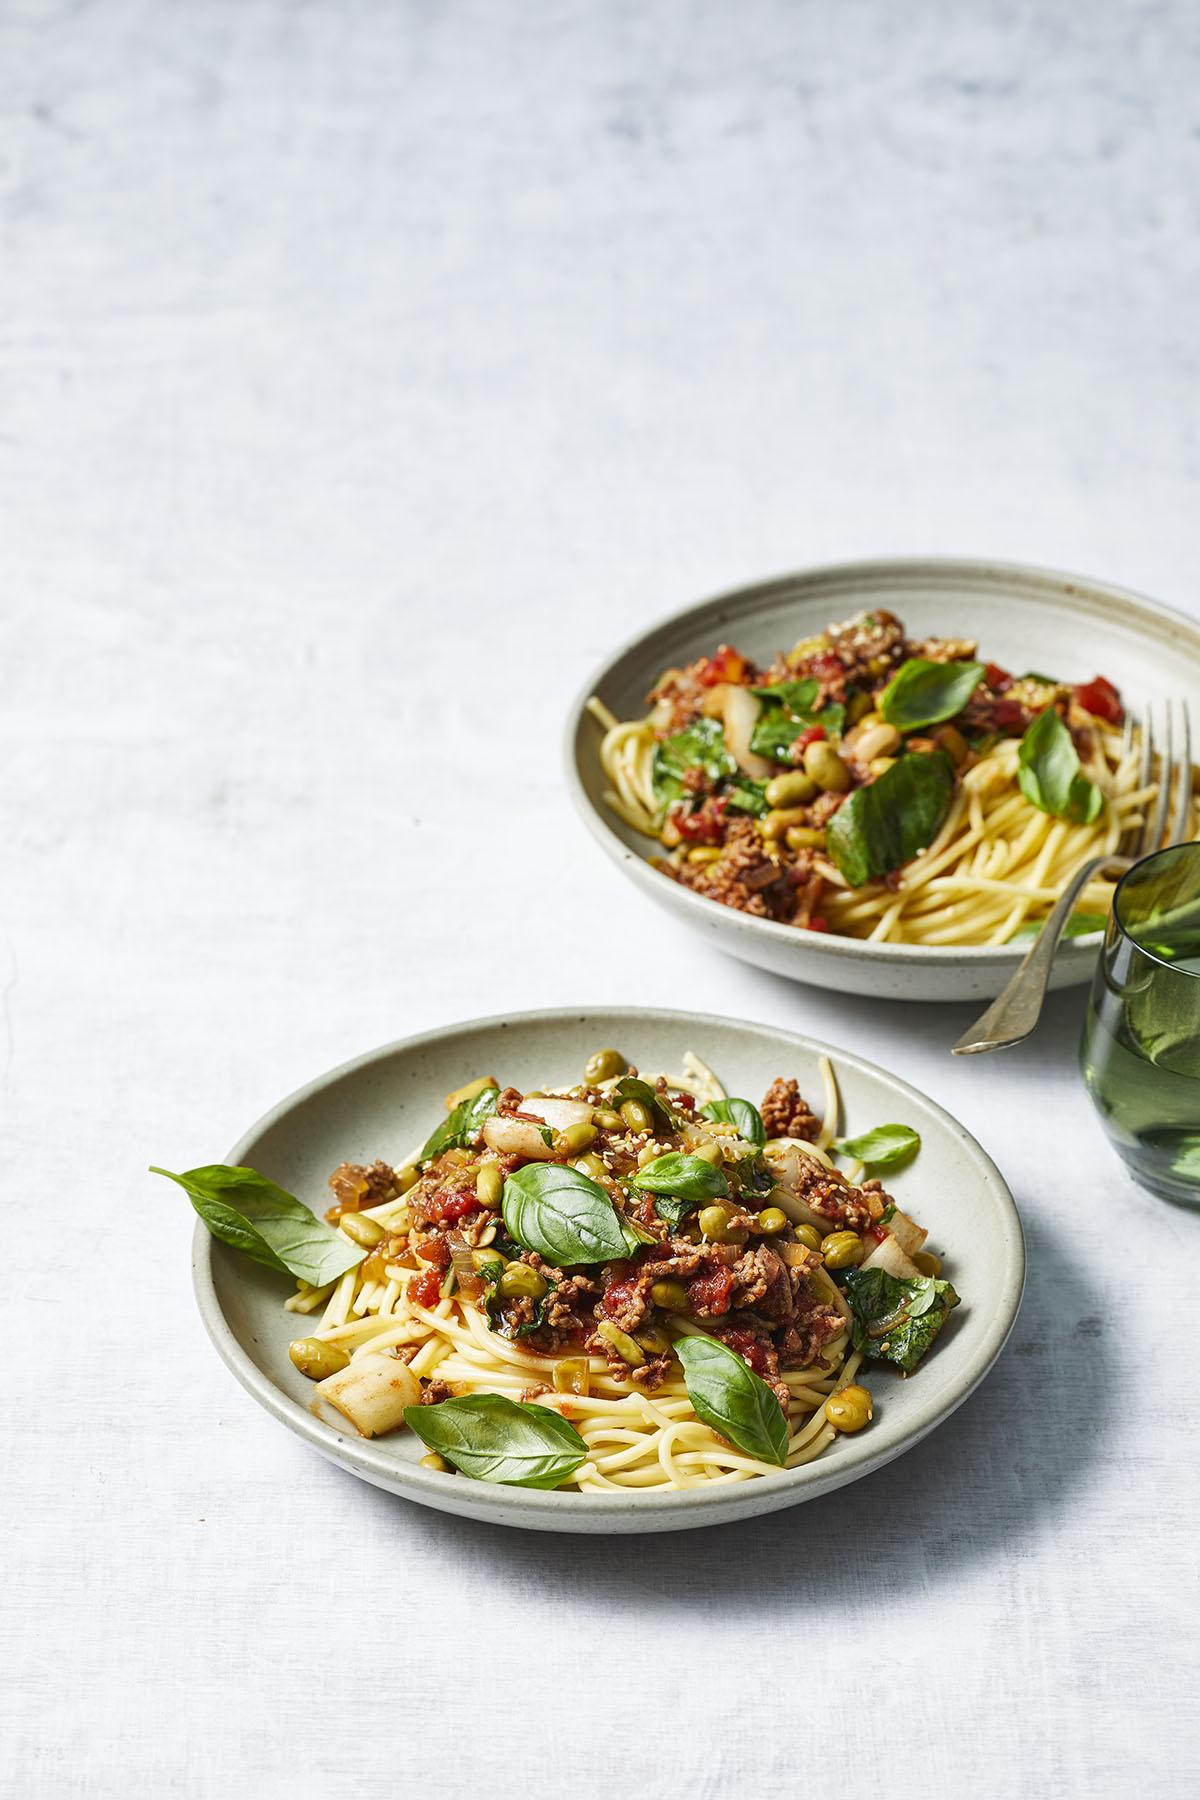 Spaghetti asiatica